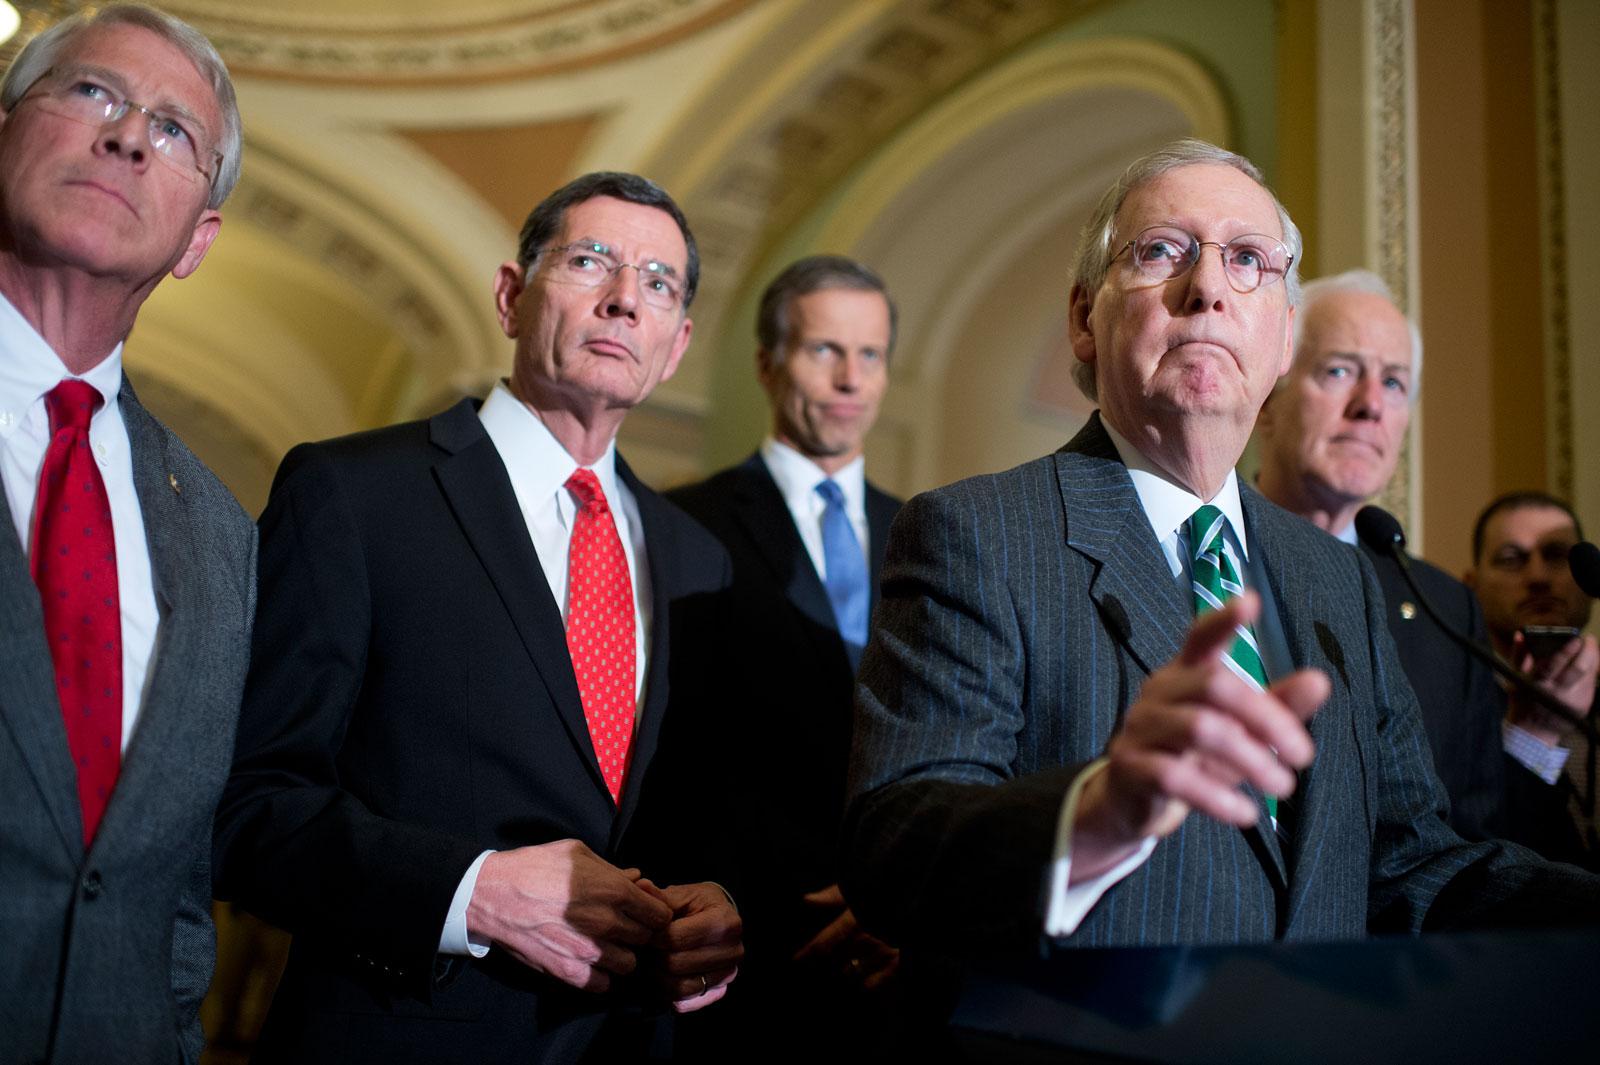 Republican Senators Roger Wicker, John Barrasso, and John Thune, Senate Majority Leader Mitch McConnell, and Majority Whip John Cornyn, Washington, D.C., February 9, 2016